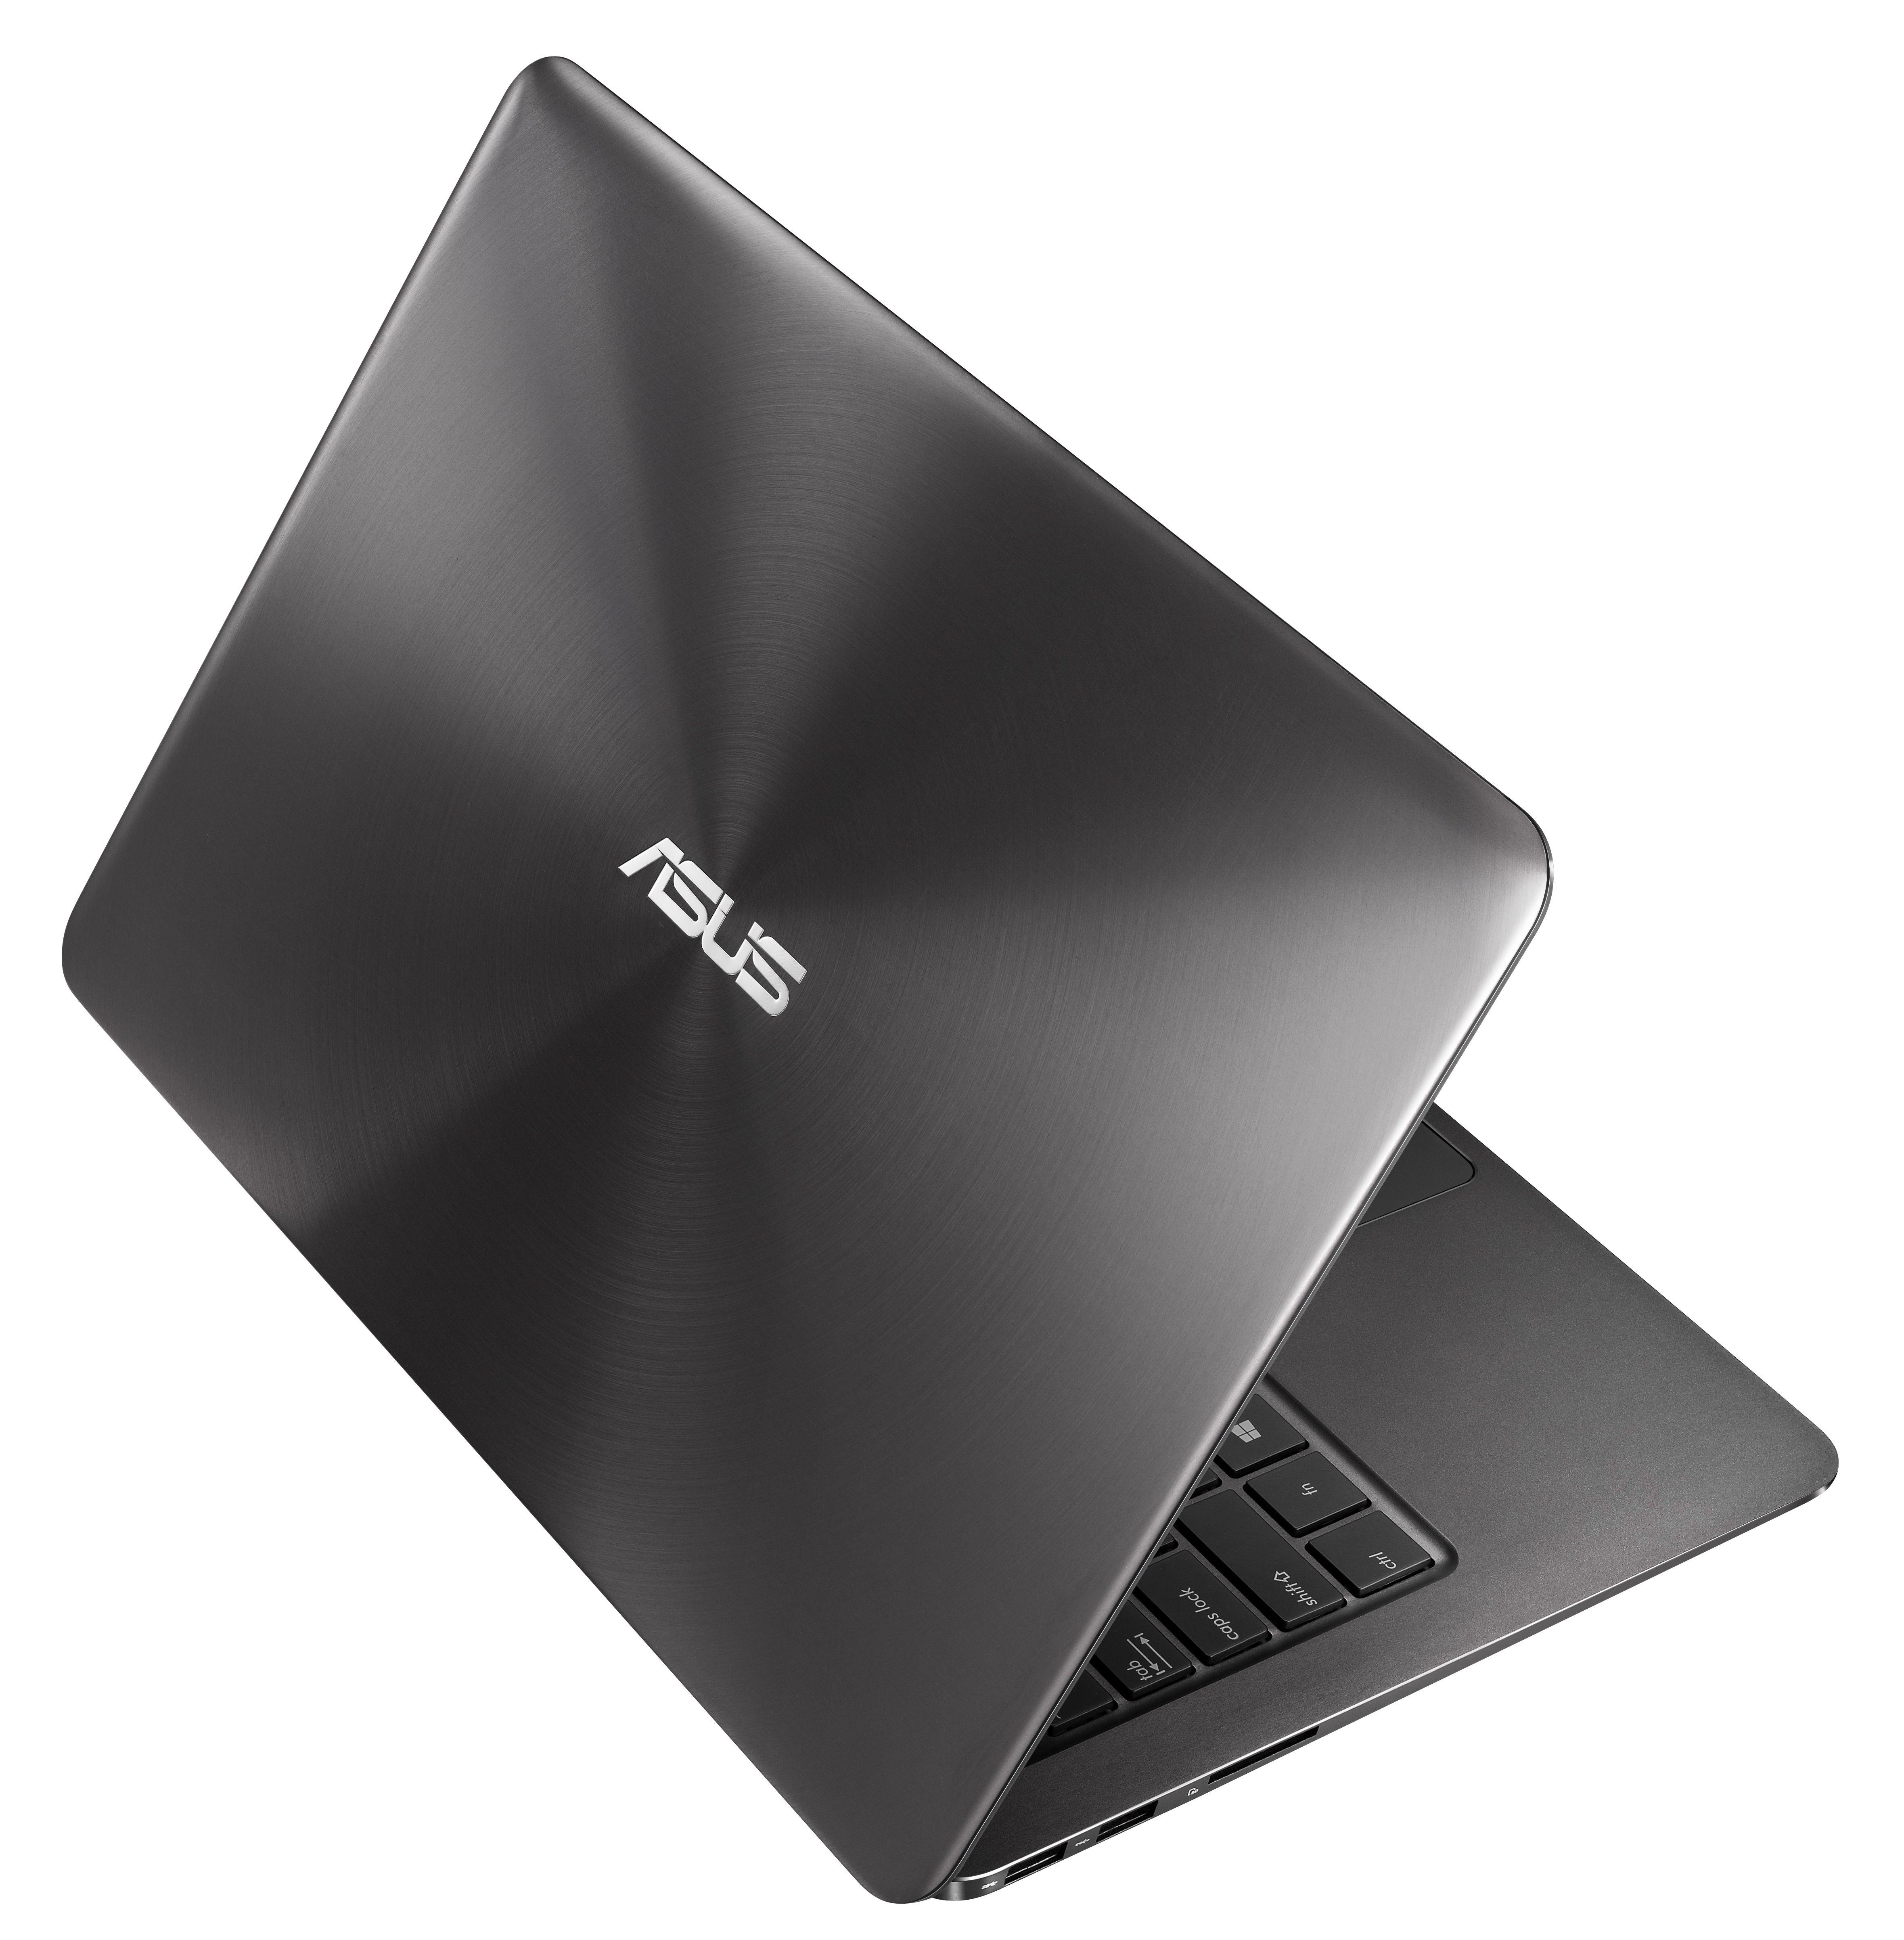 ASUS ZenBook UX305 World s slimmest 13 3 inch QHD laptop measuring just 12 3 mm